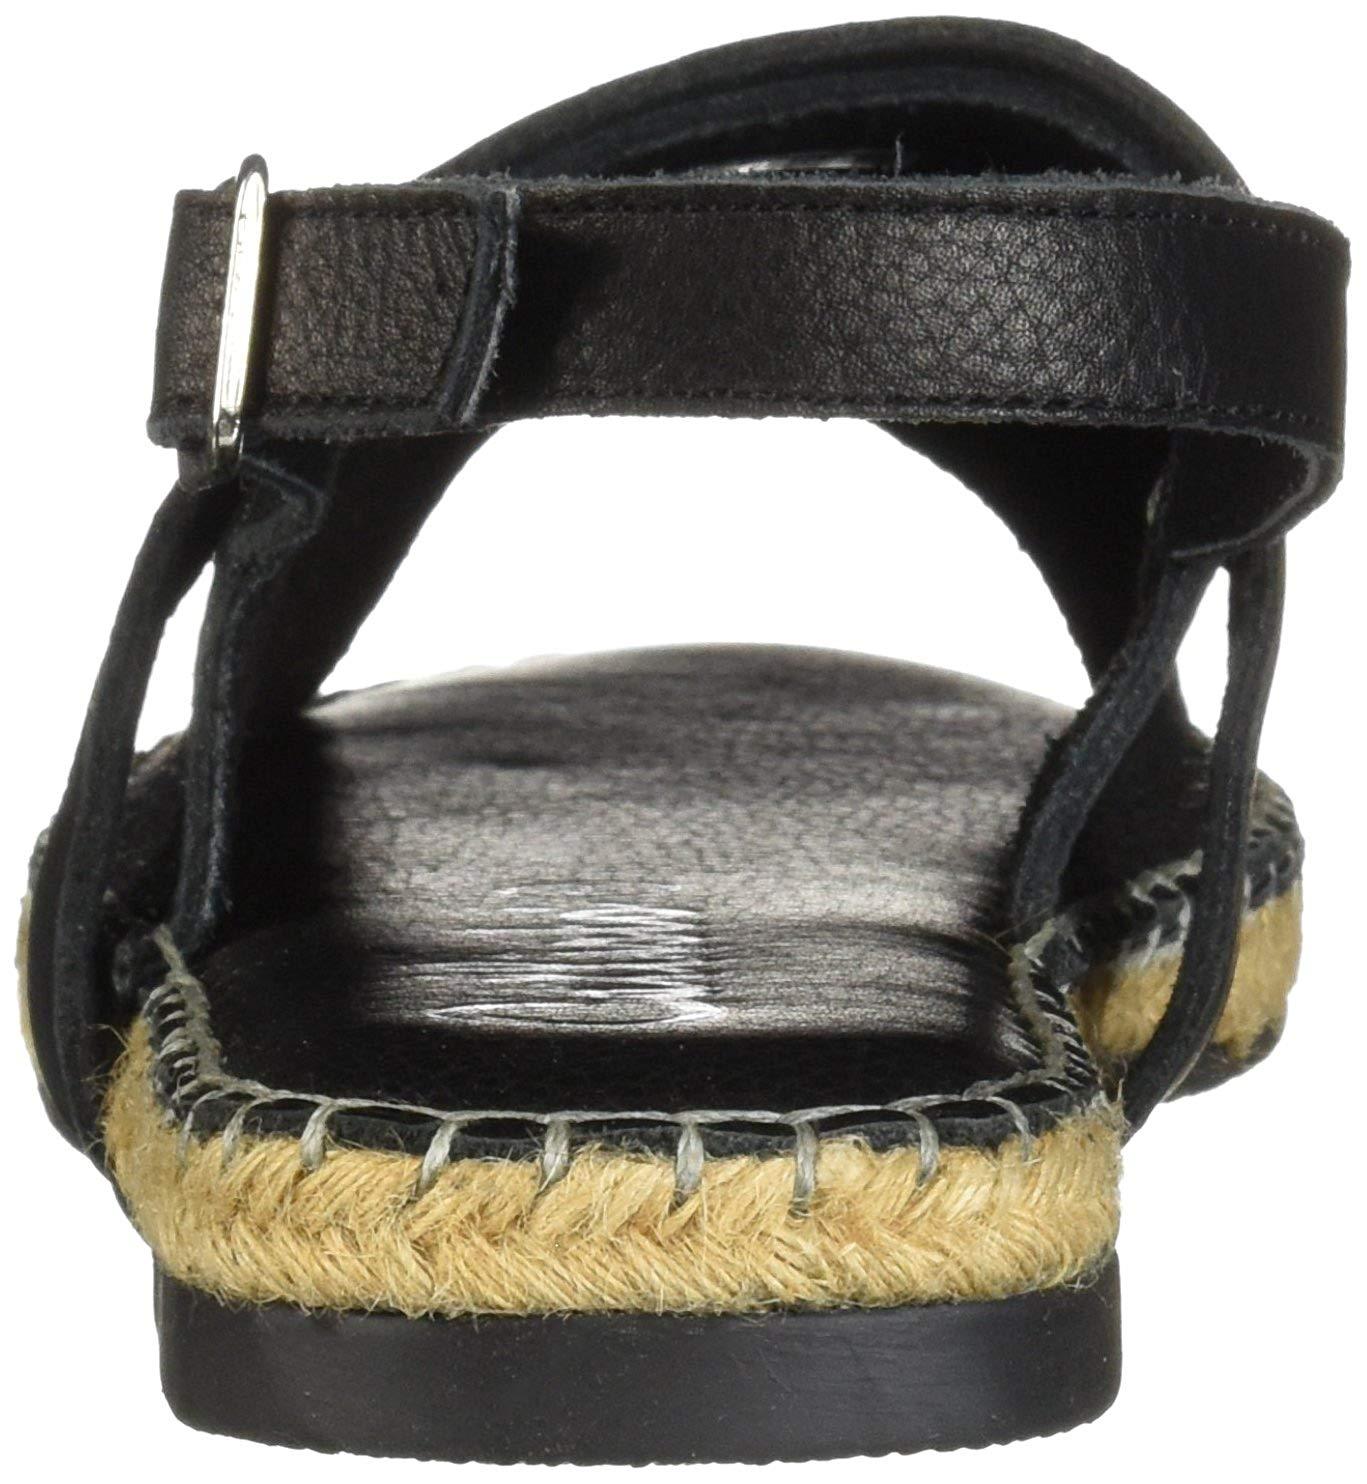 5b92262133a5e Callisto Women s Turn Key Slide Sandal